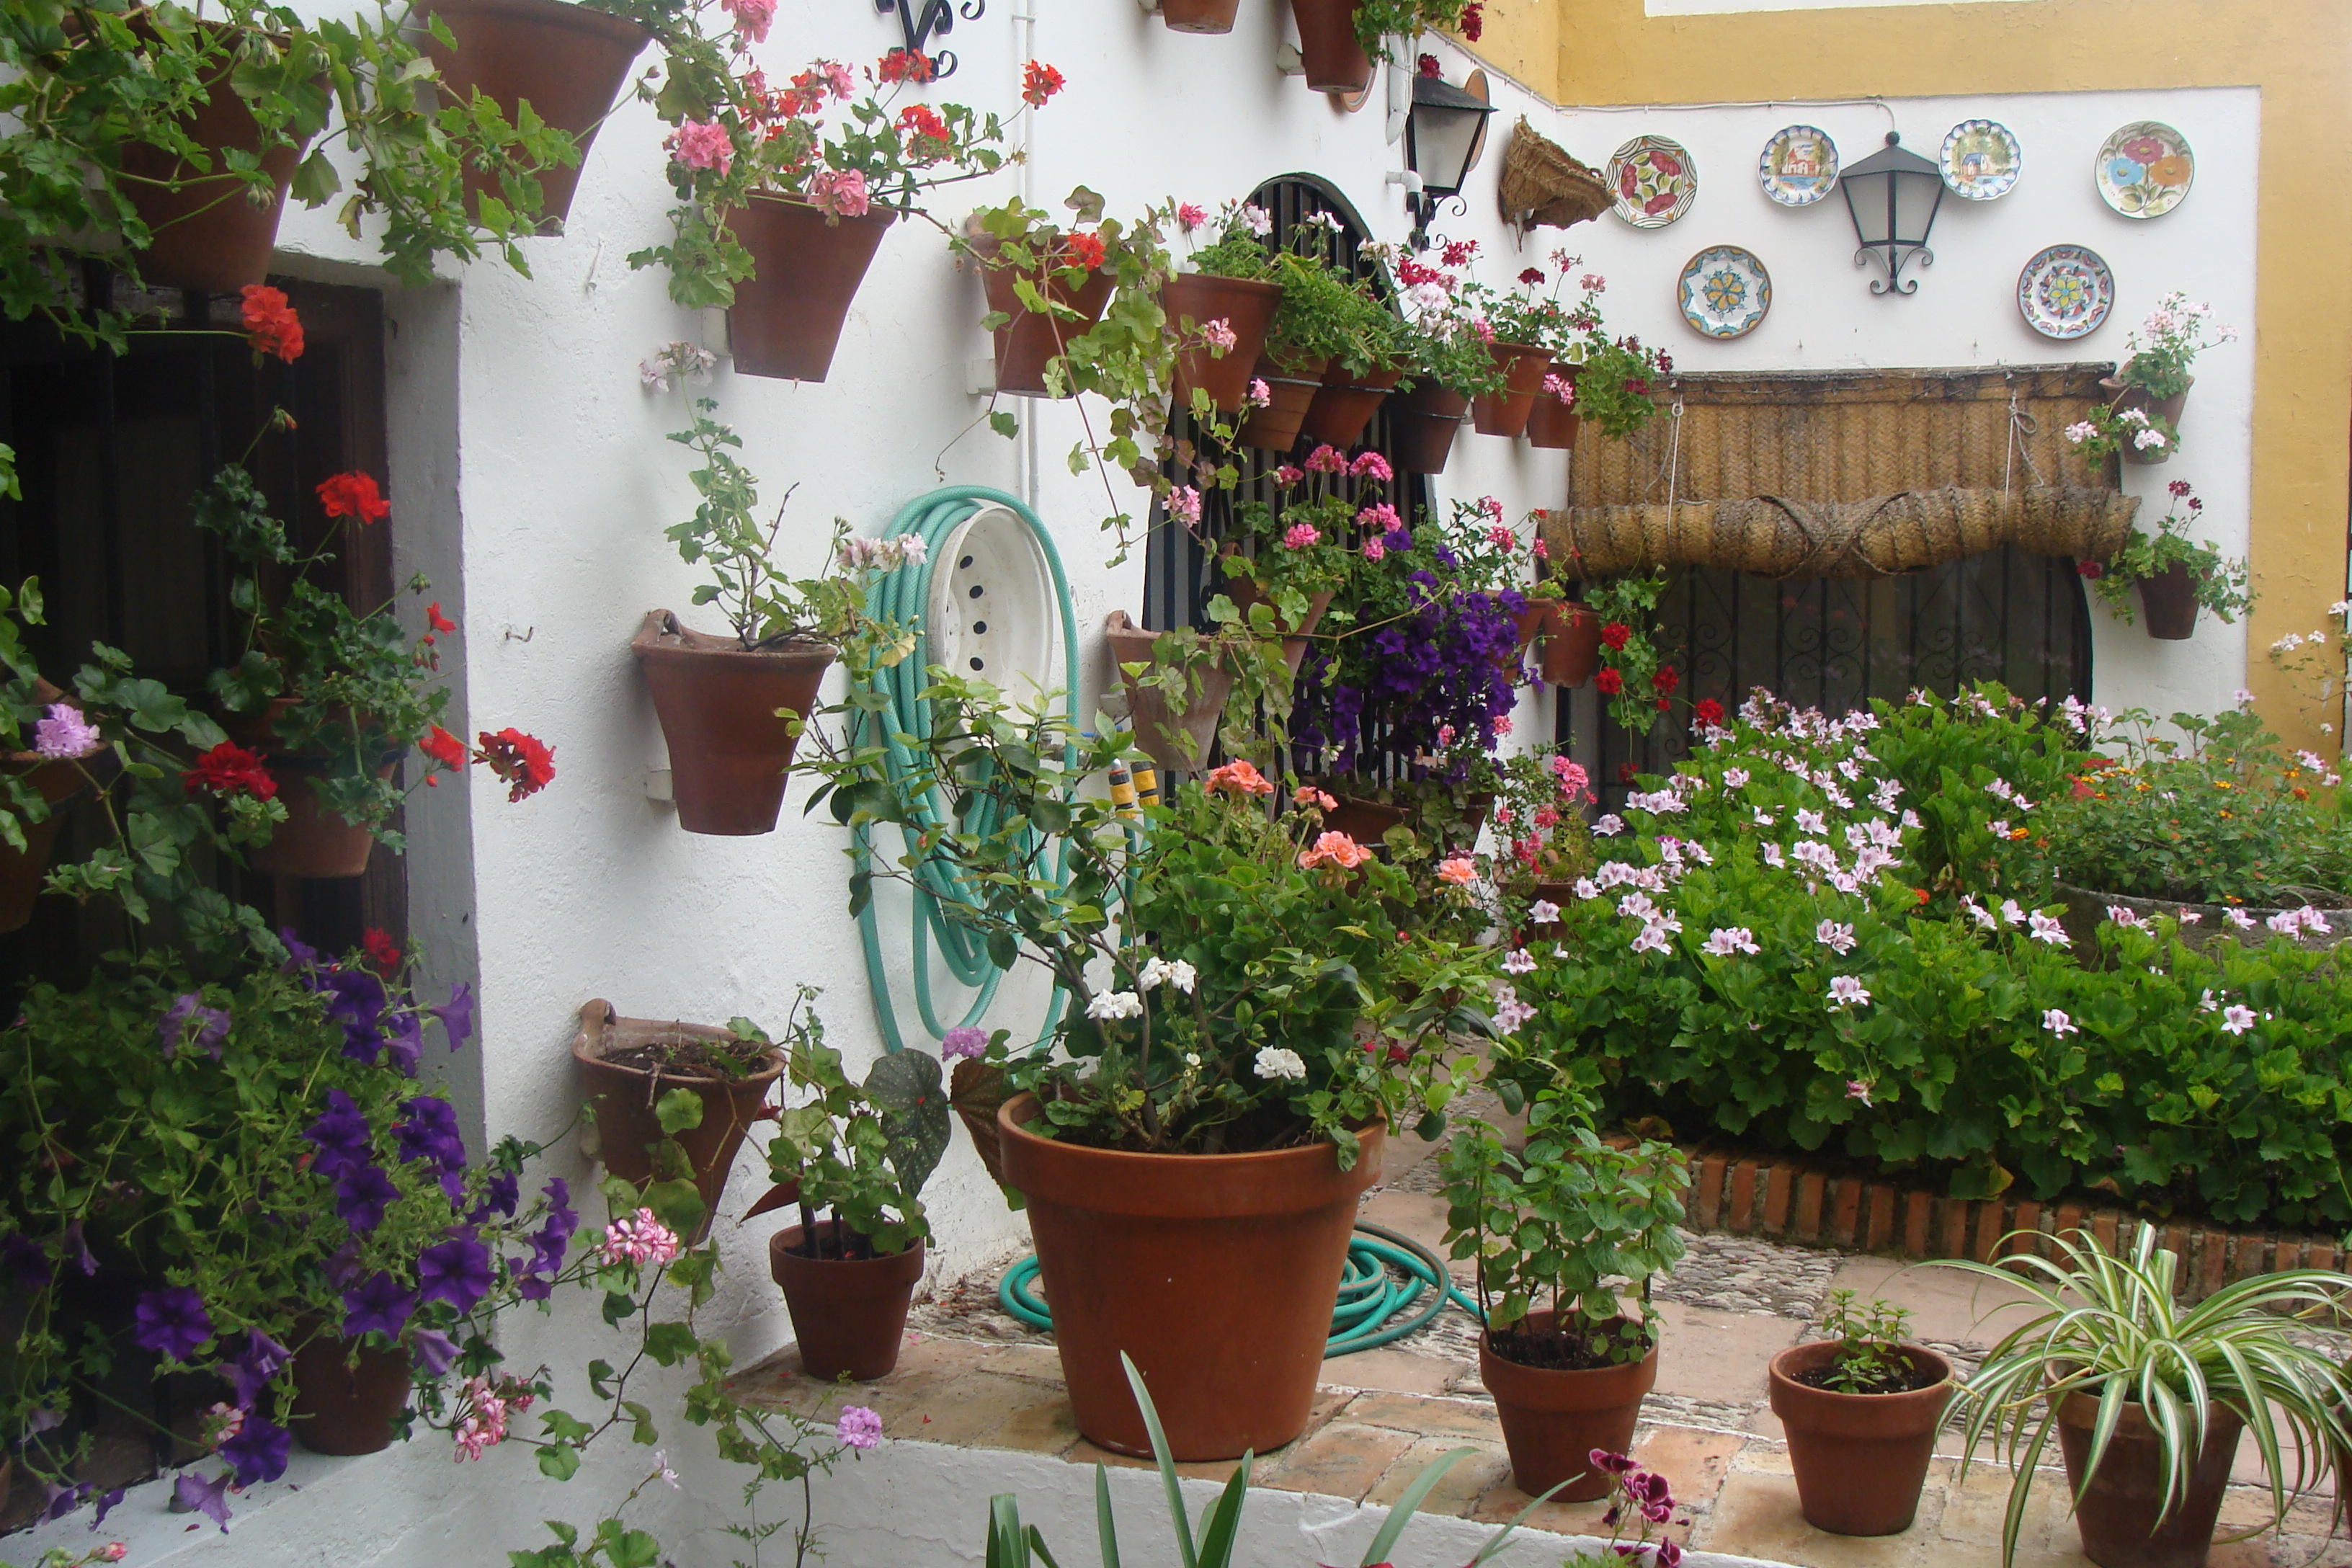 File C³rdoba Festival de los patios Wikimedia